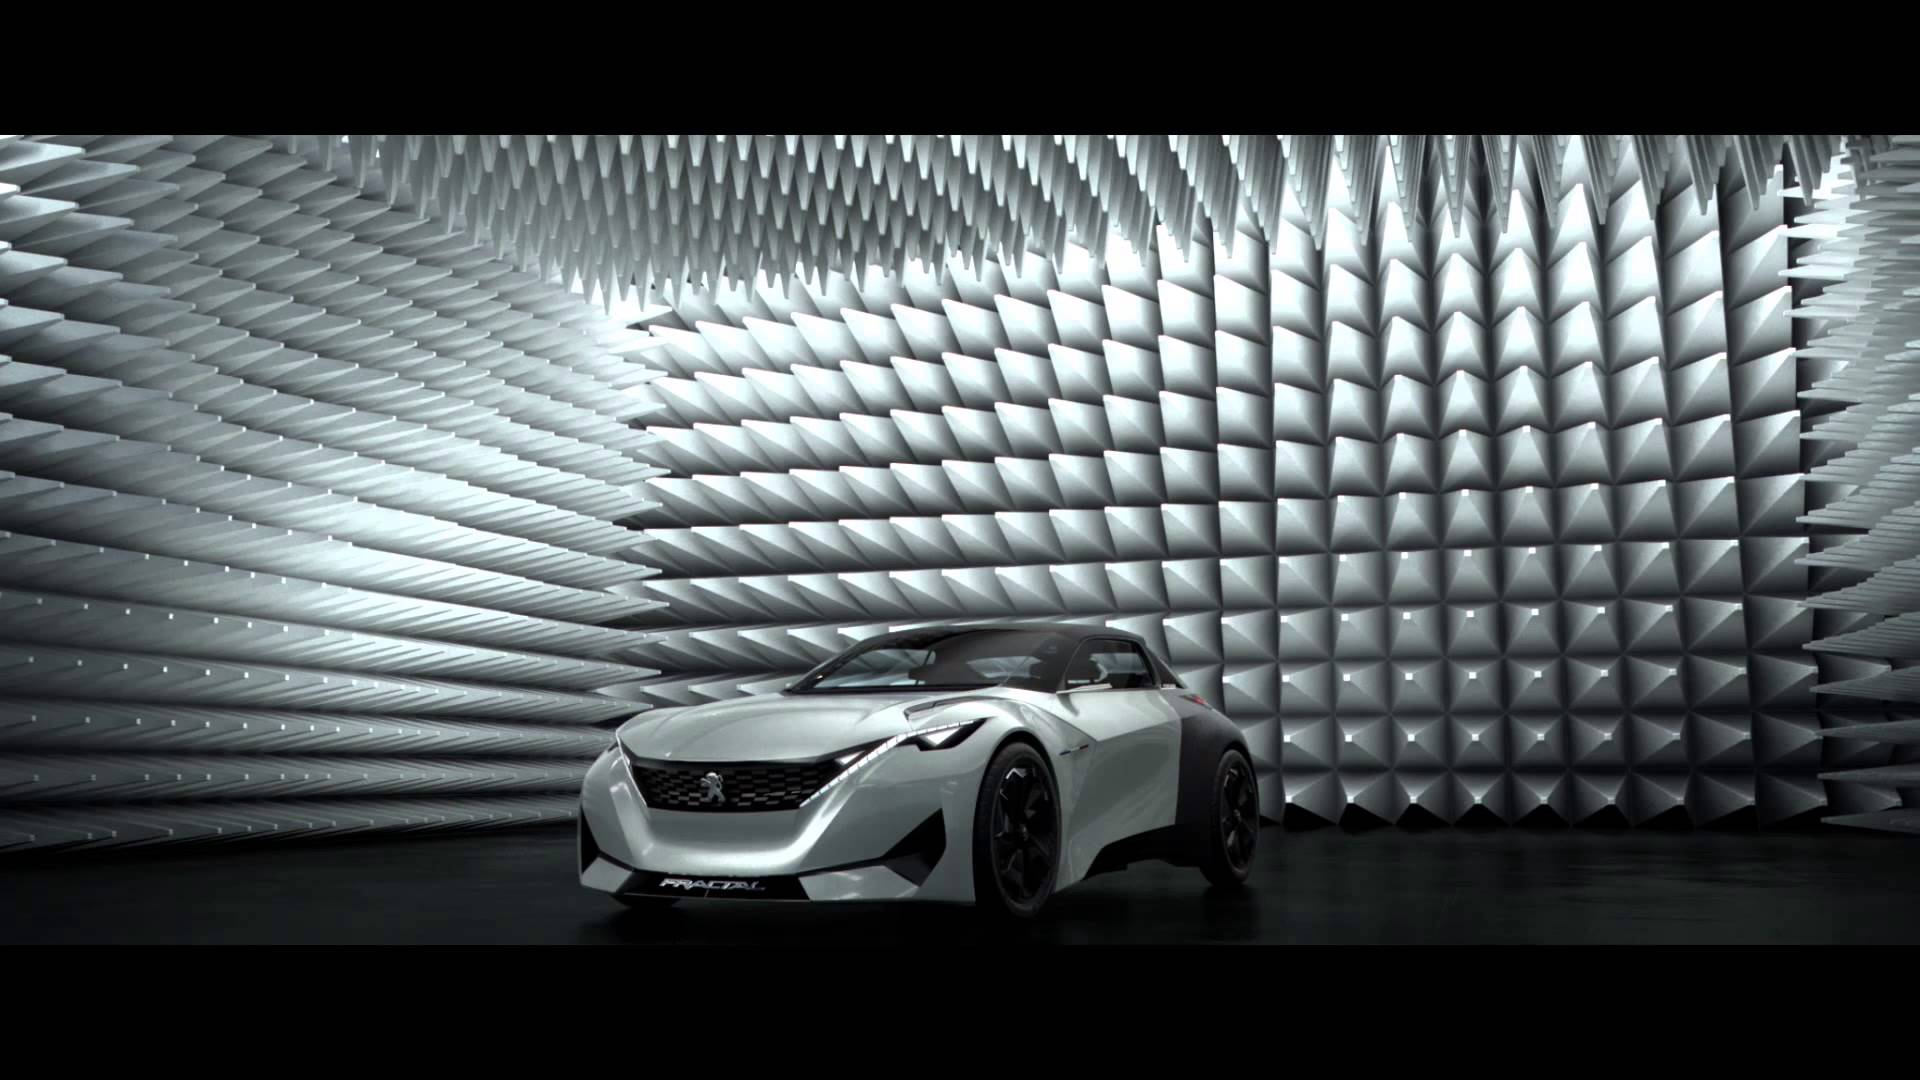 Put u budućnost: Električni Peugeot coupe-cabrio (VIDEO)